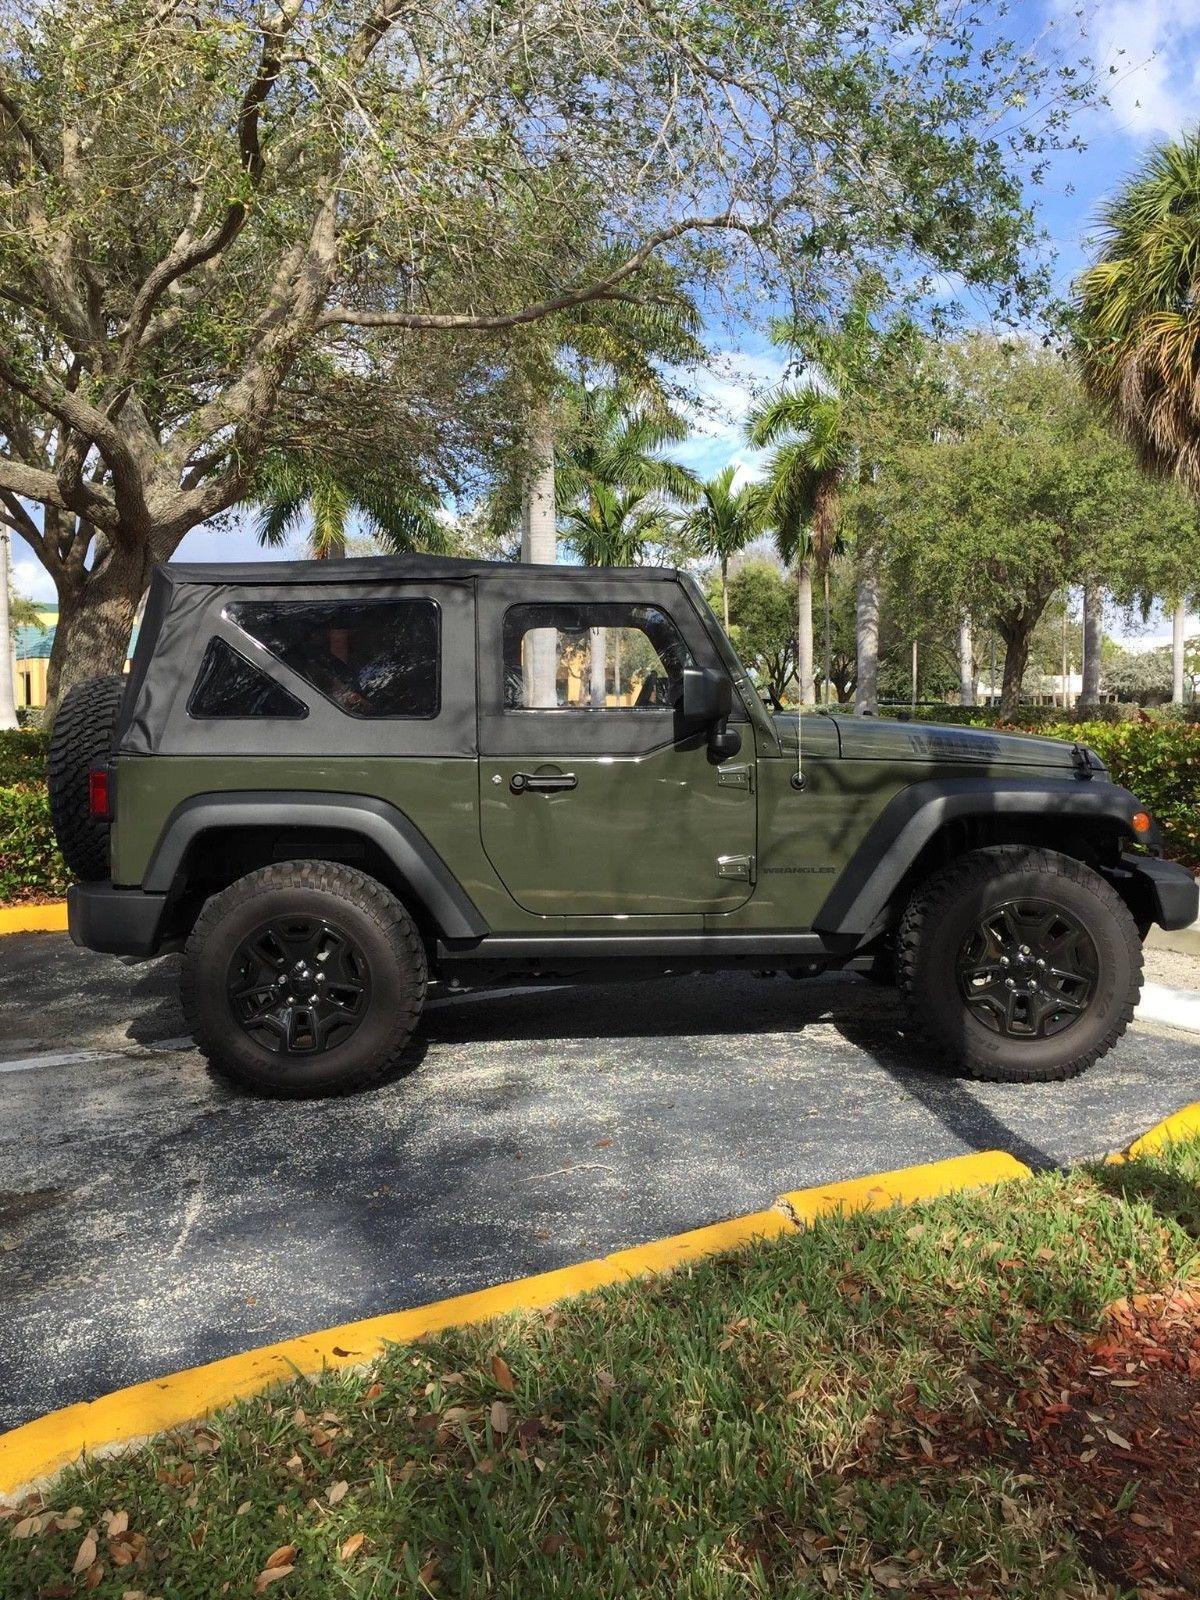 2015 Jeep Willys Wheeler Side View Willys Jeep Wrangler Willys